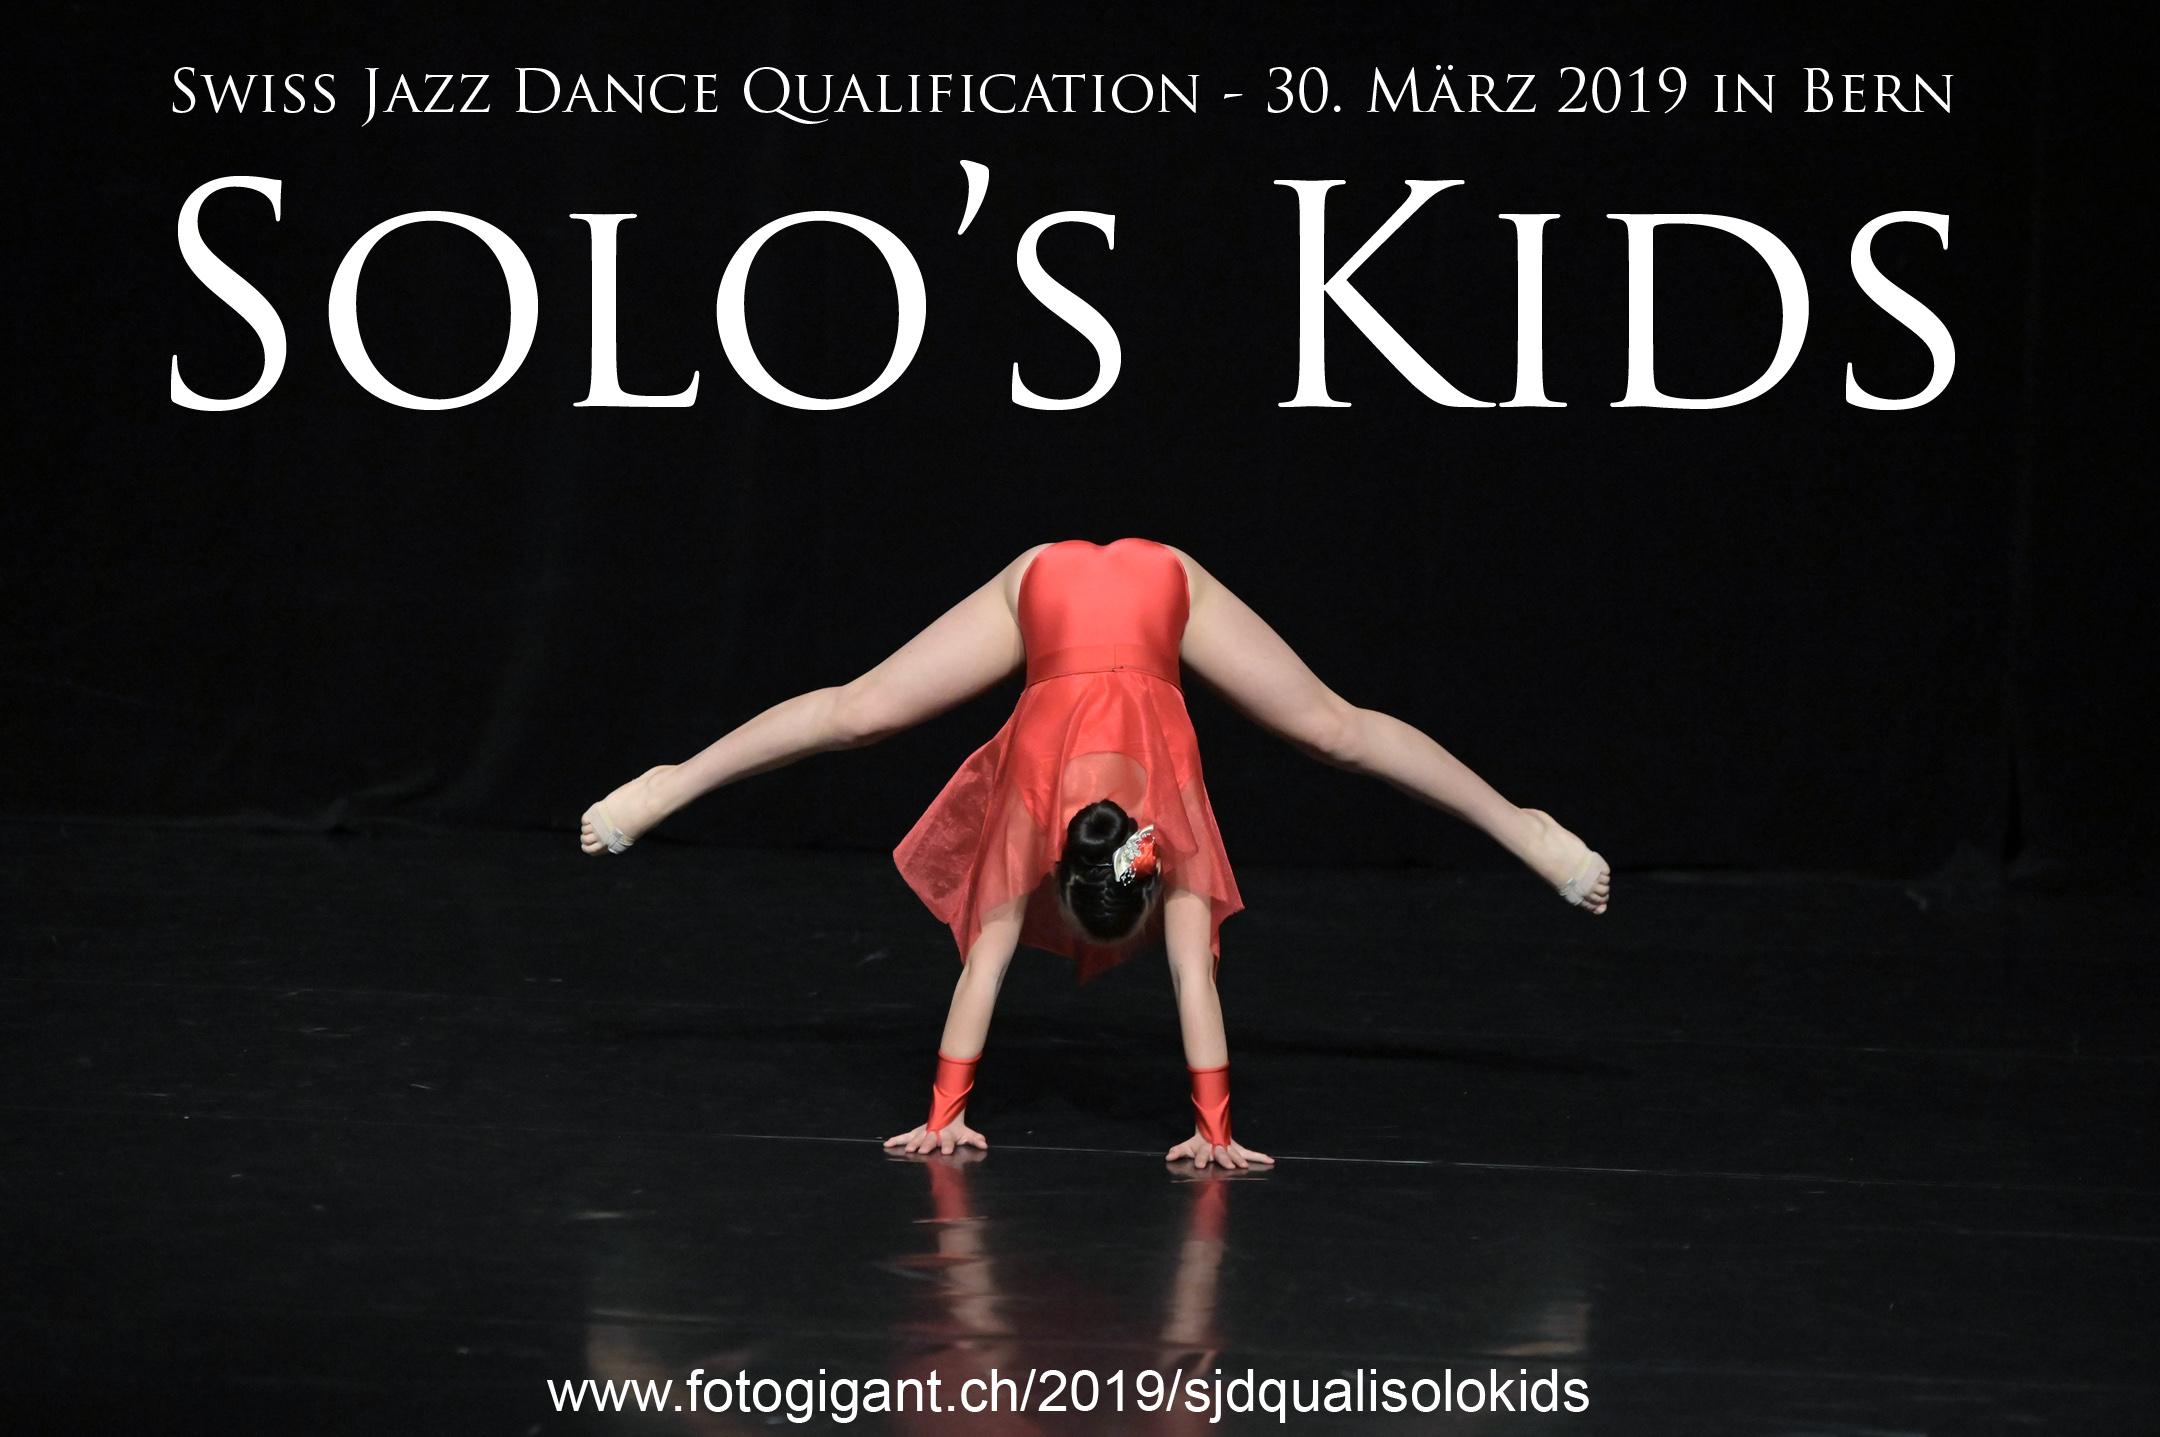 www.fotogigant.ch/2019/sjdqualisolokids